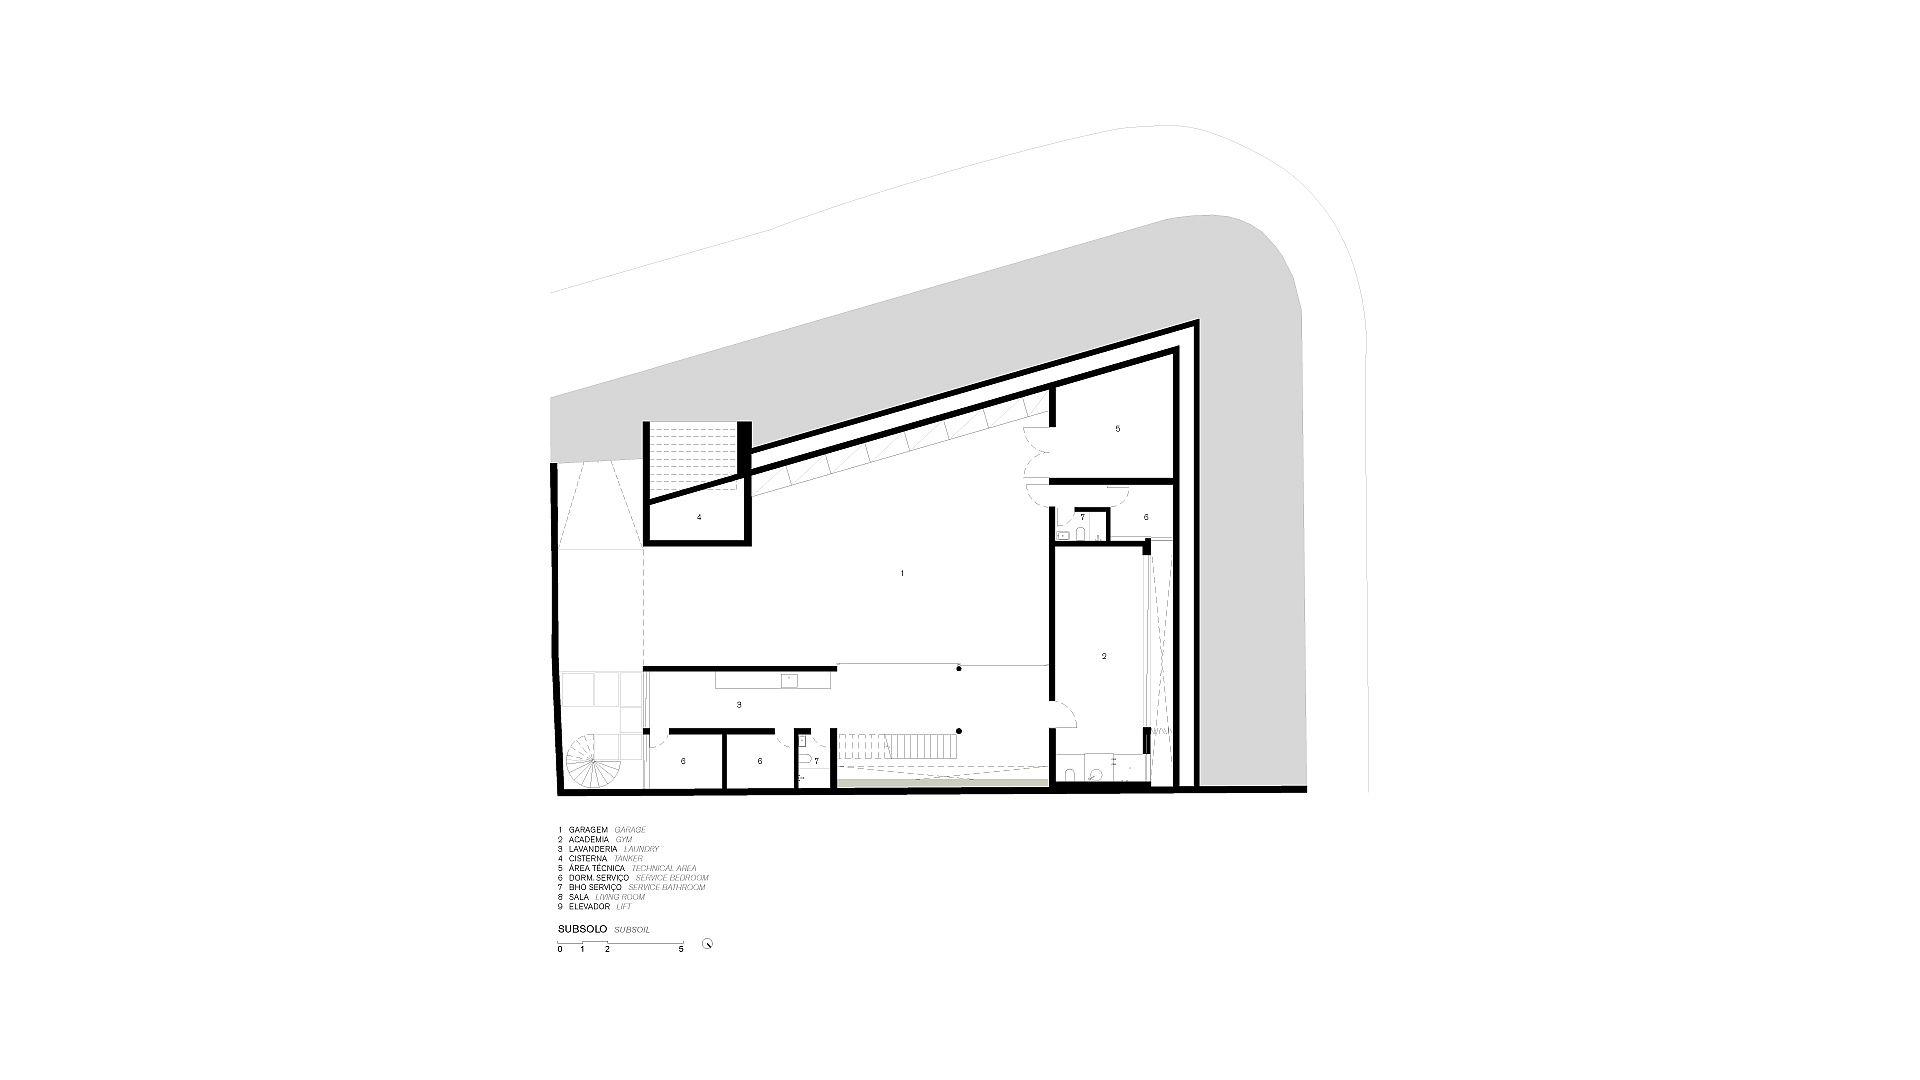 Underground level floor plan of JZL House